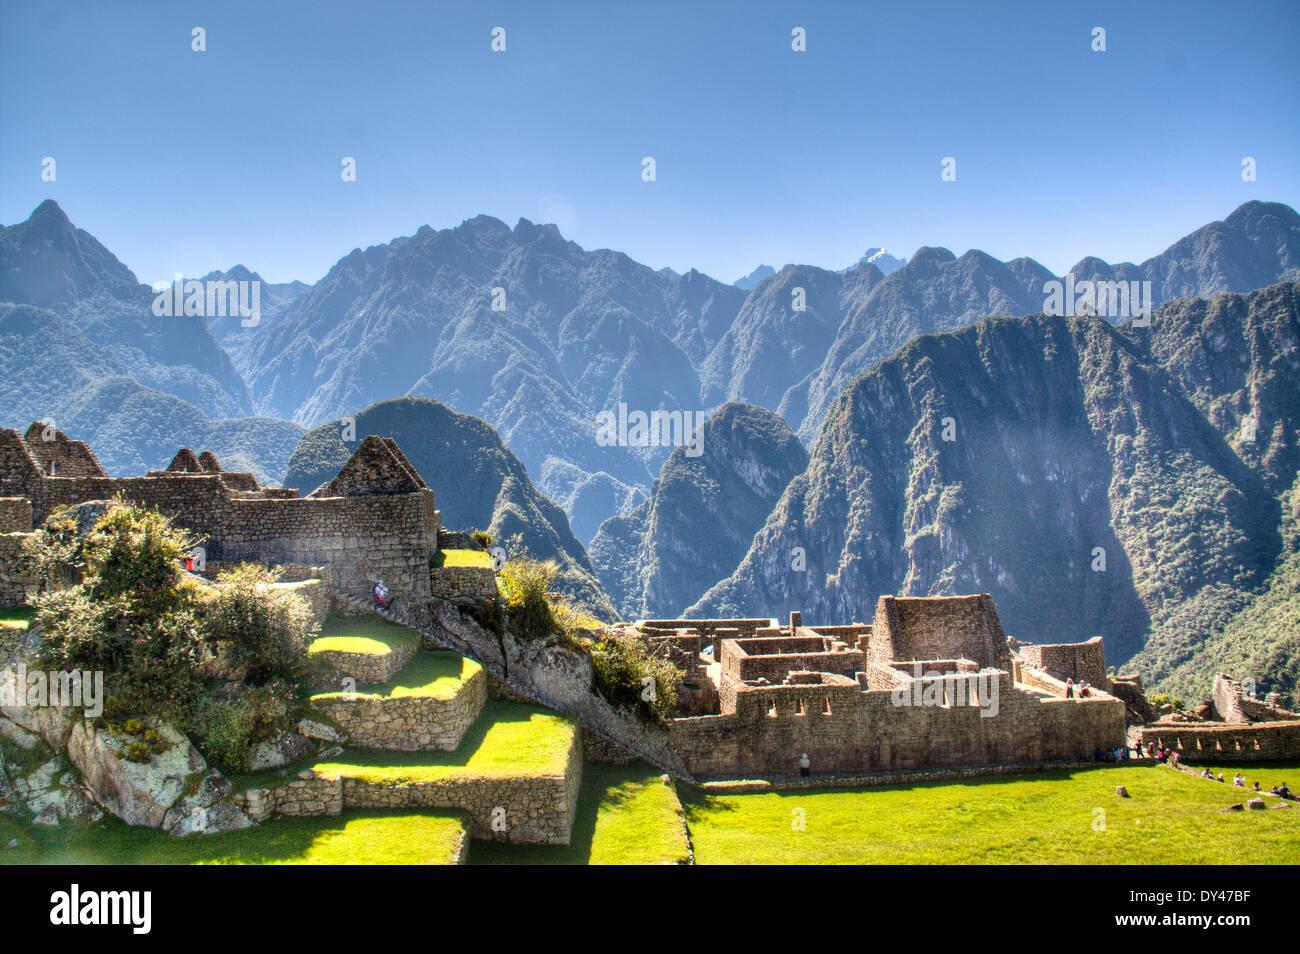 Machu Picchu dans la vallée sacrée du Pérou Photo Stock